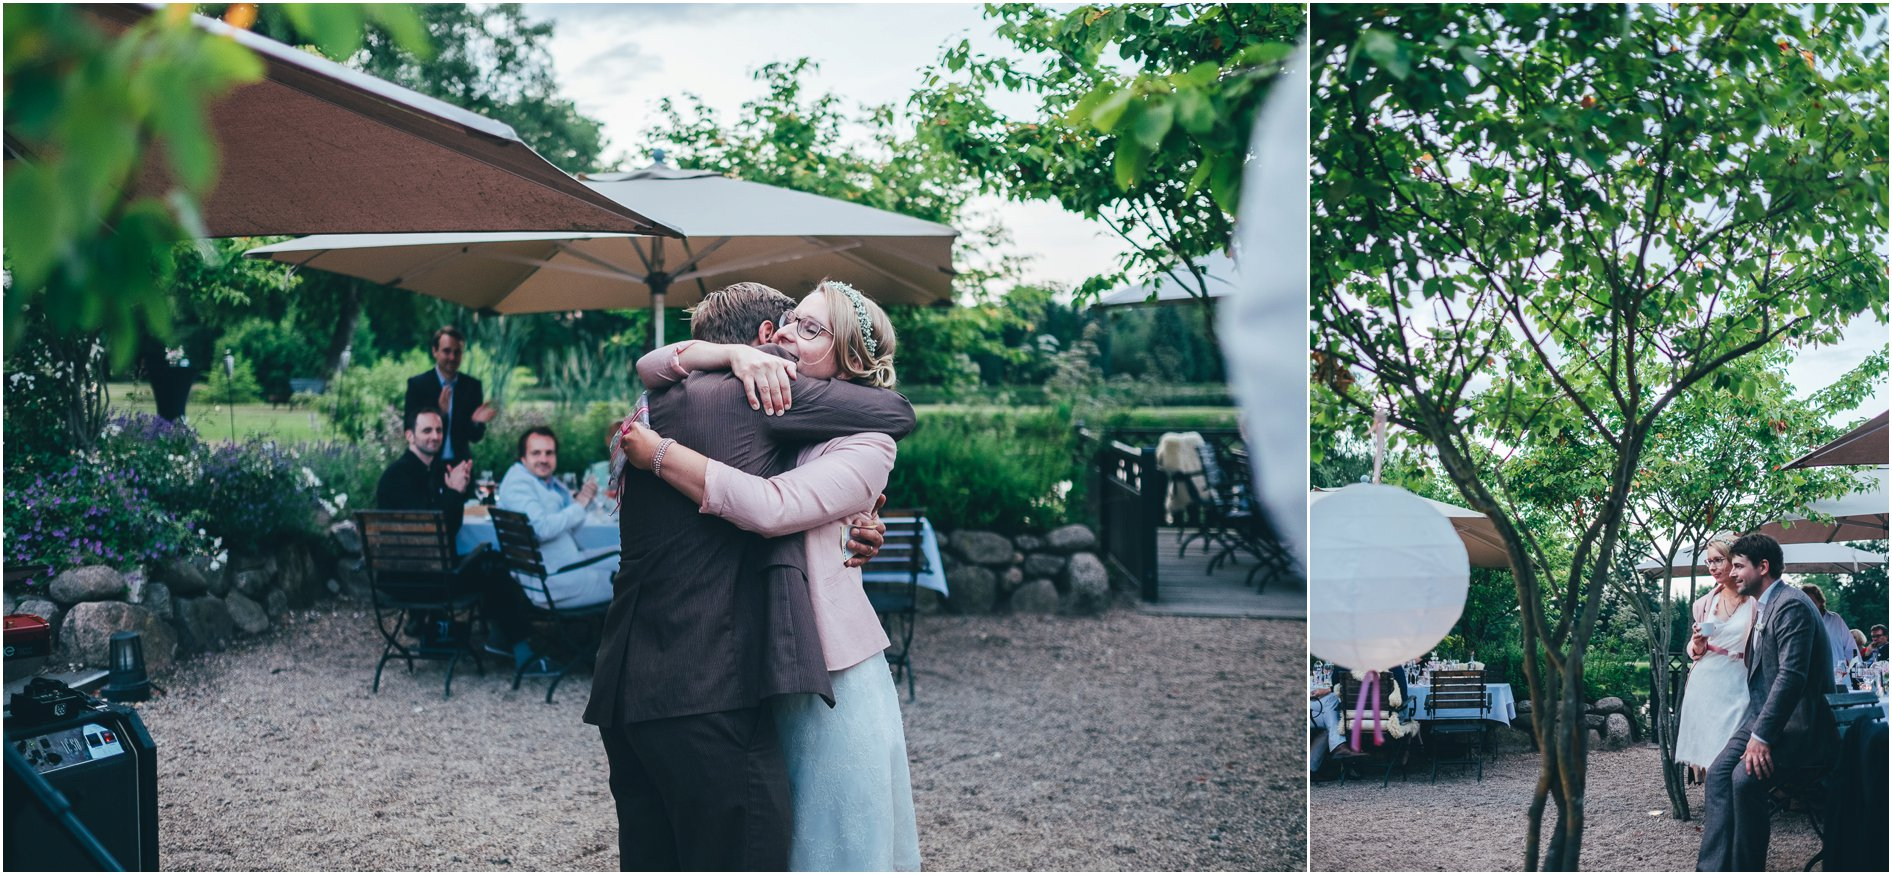 2016-04-19_0100 Sandra & Janis - Hochzeitsfotograf in Seevetal